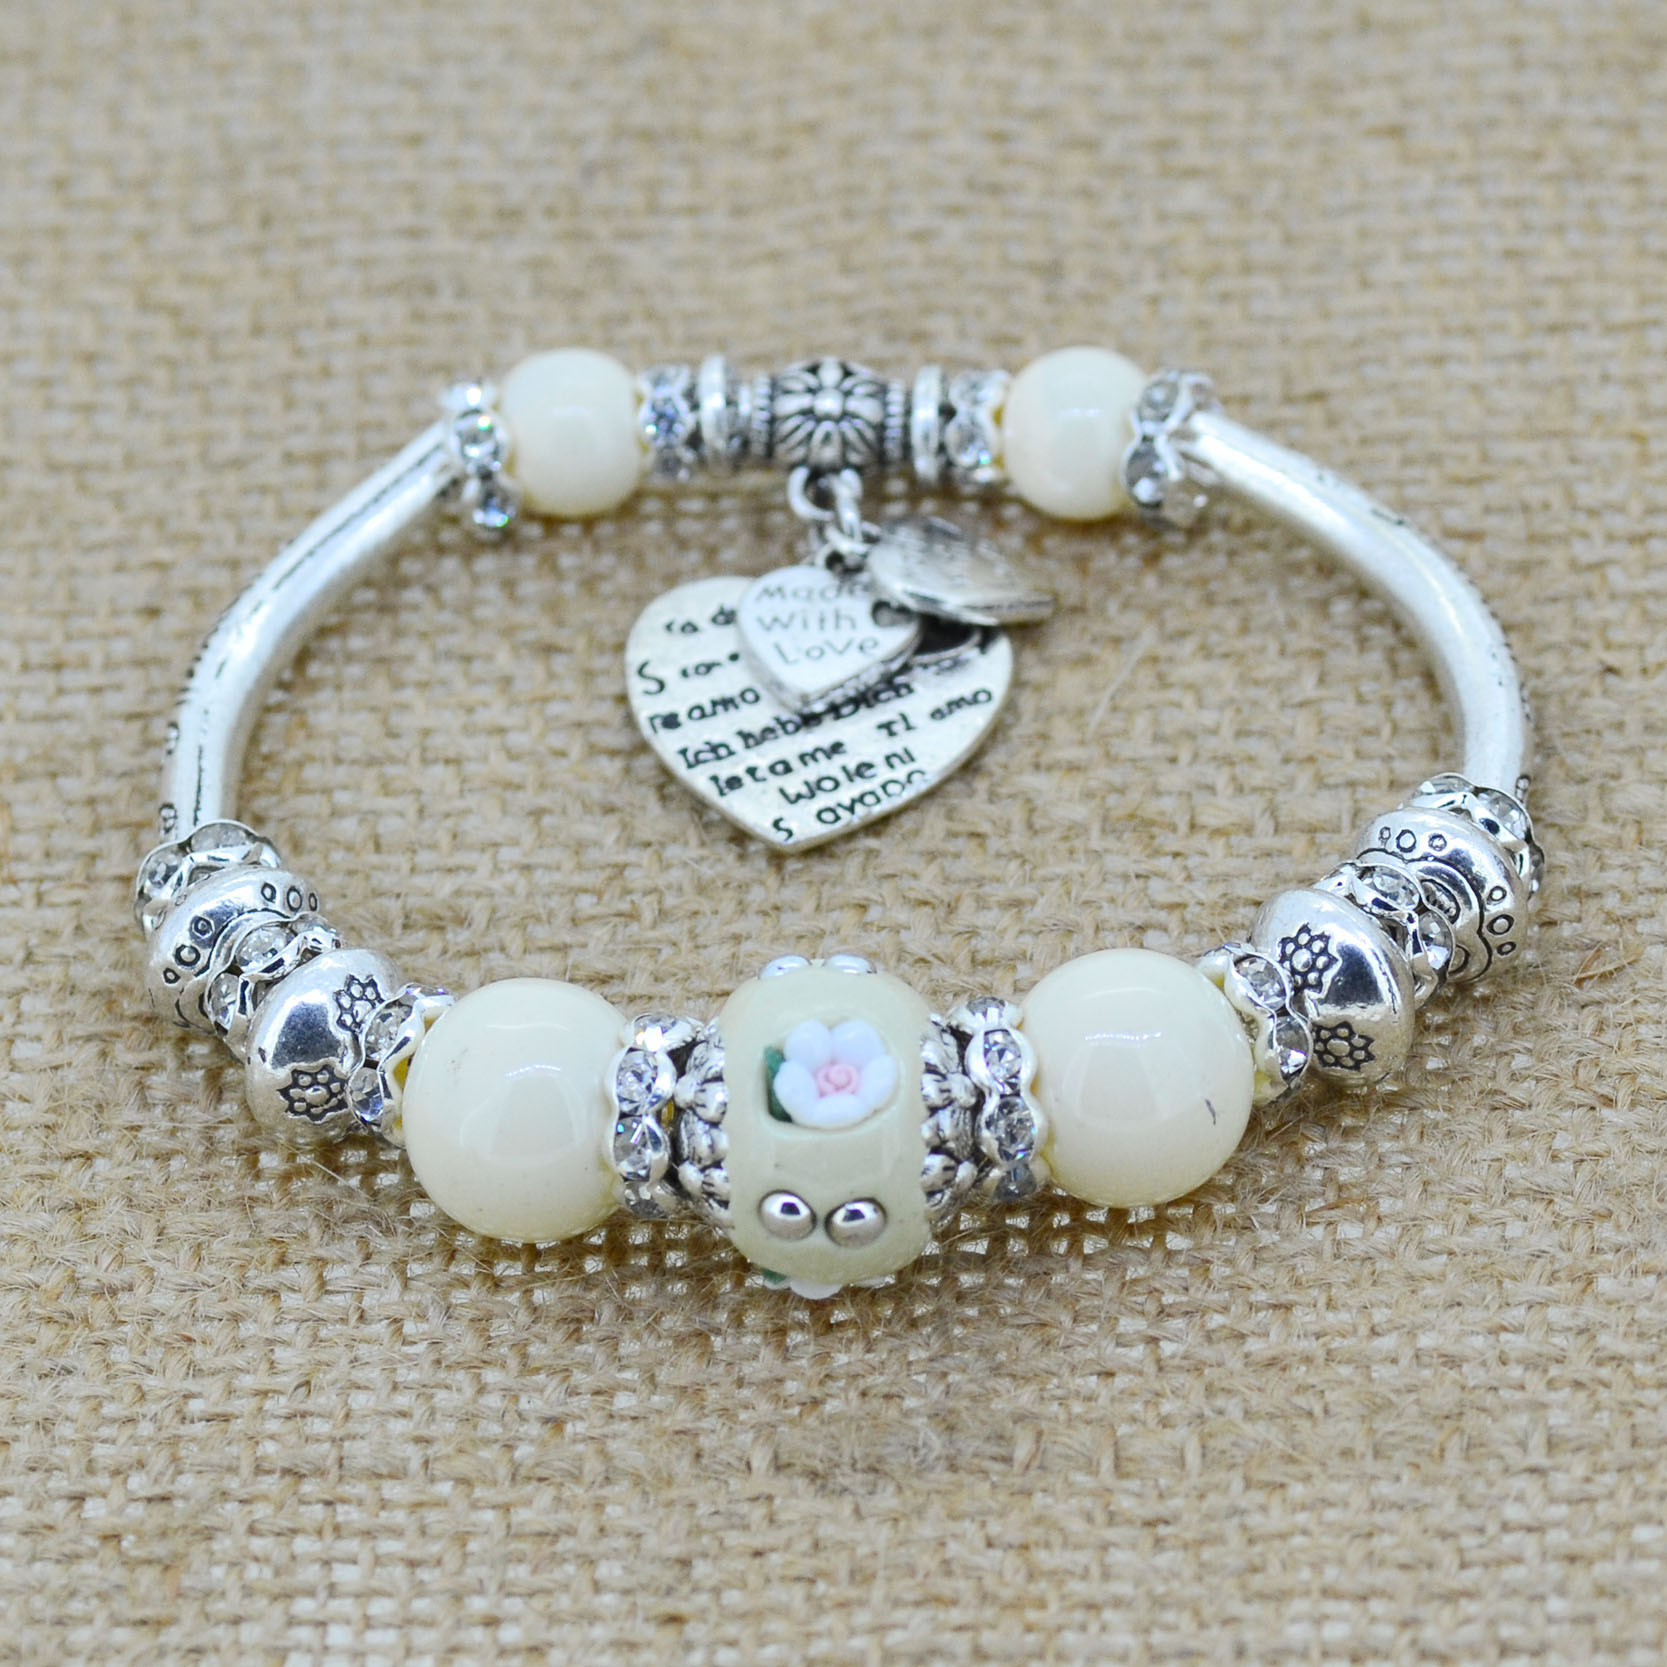 Fashion jewelry silver love heart charm bracelet bangles glass beads